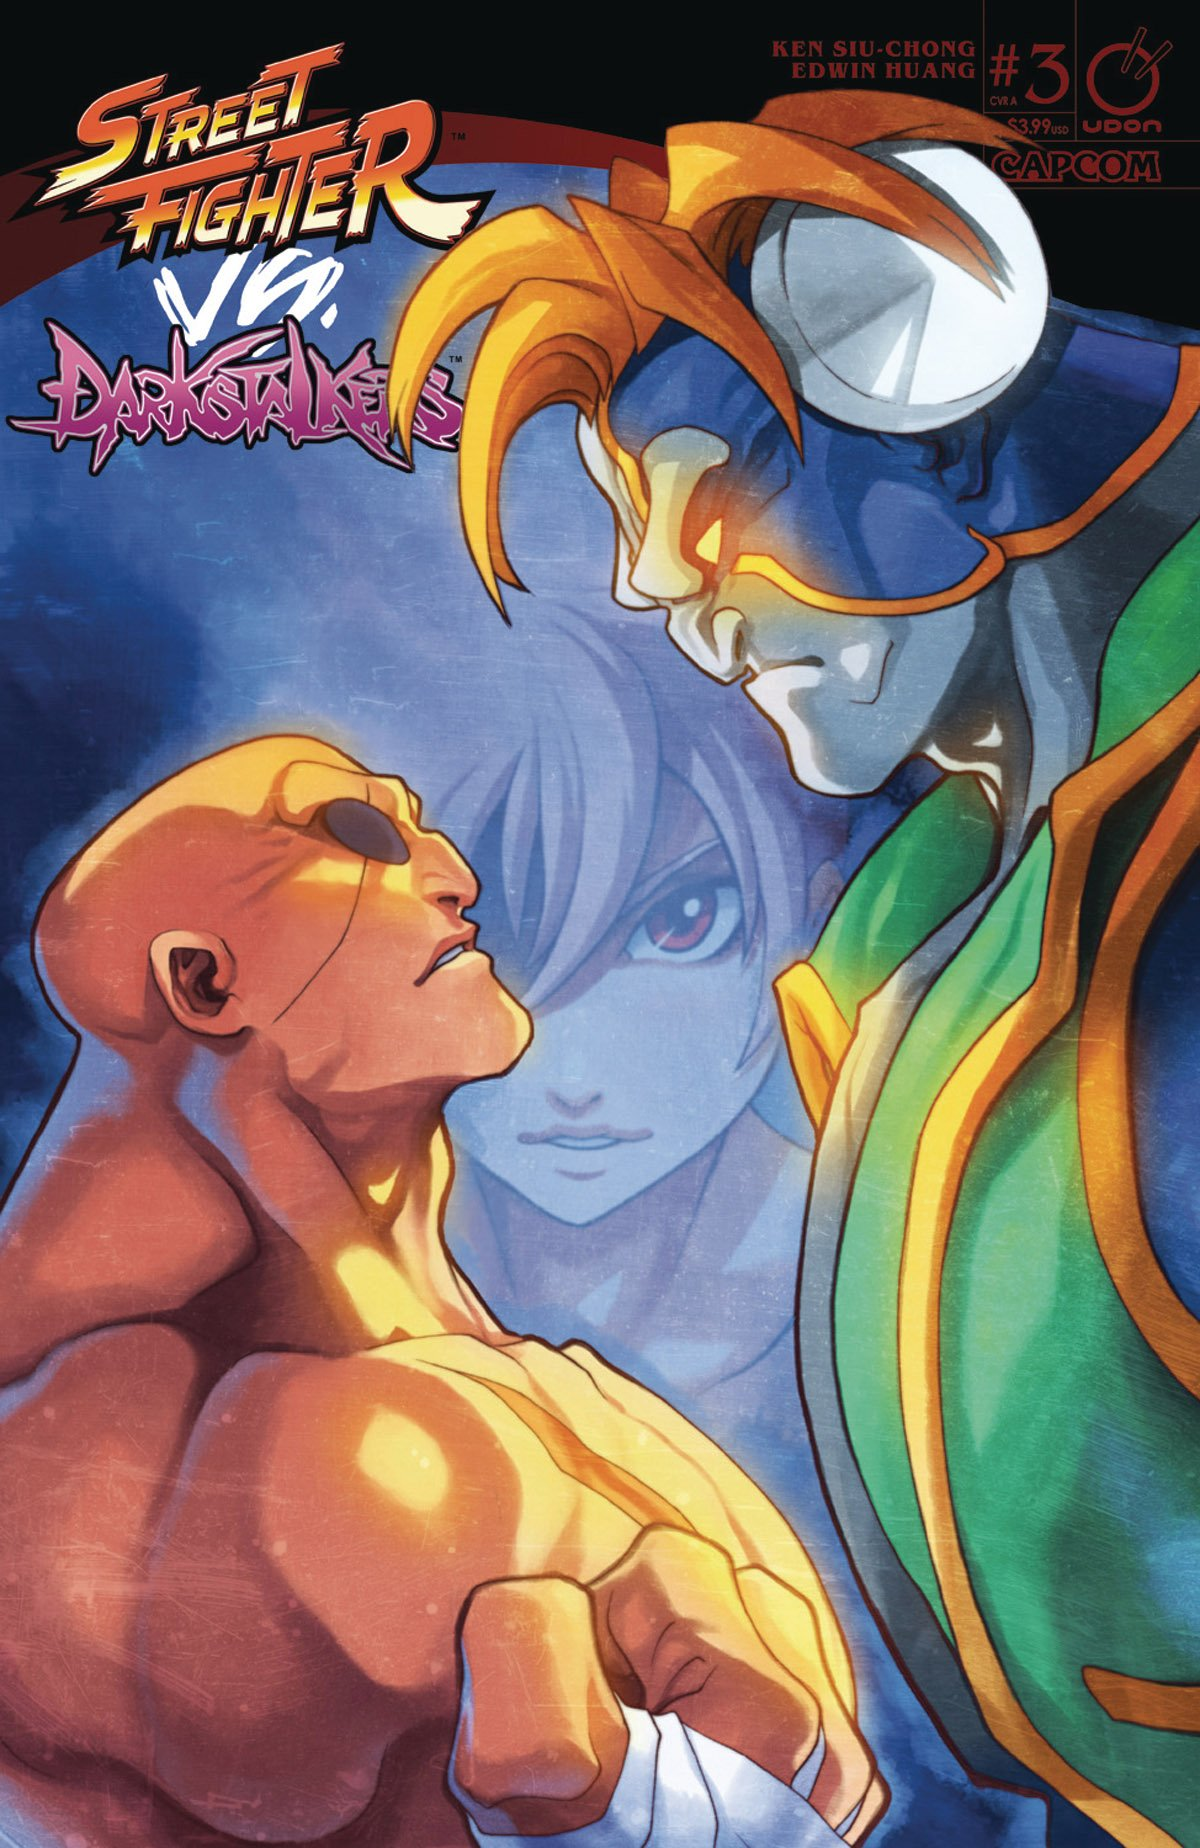 Street Fighter VS Darkstalkers 003 (June 2017) (cover A)